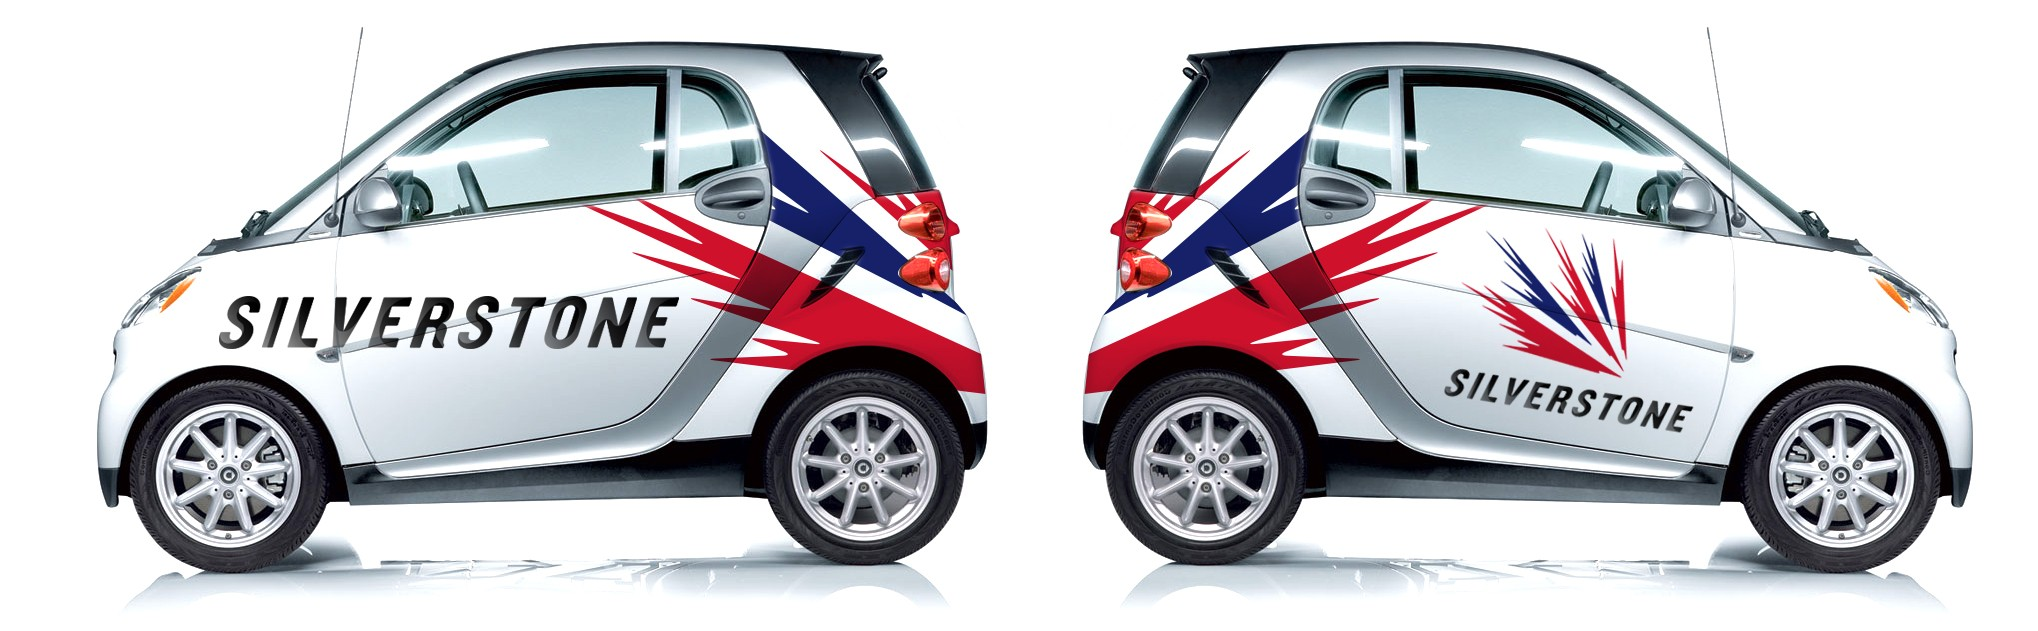 Silverstone-car